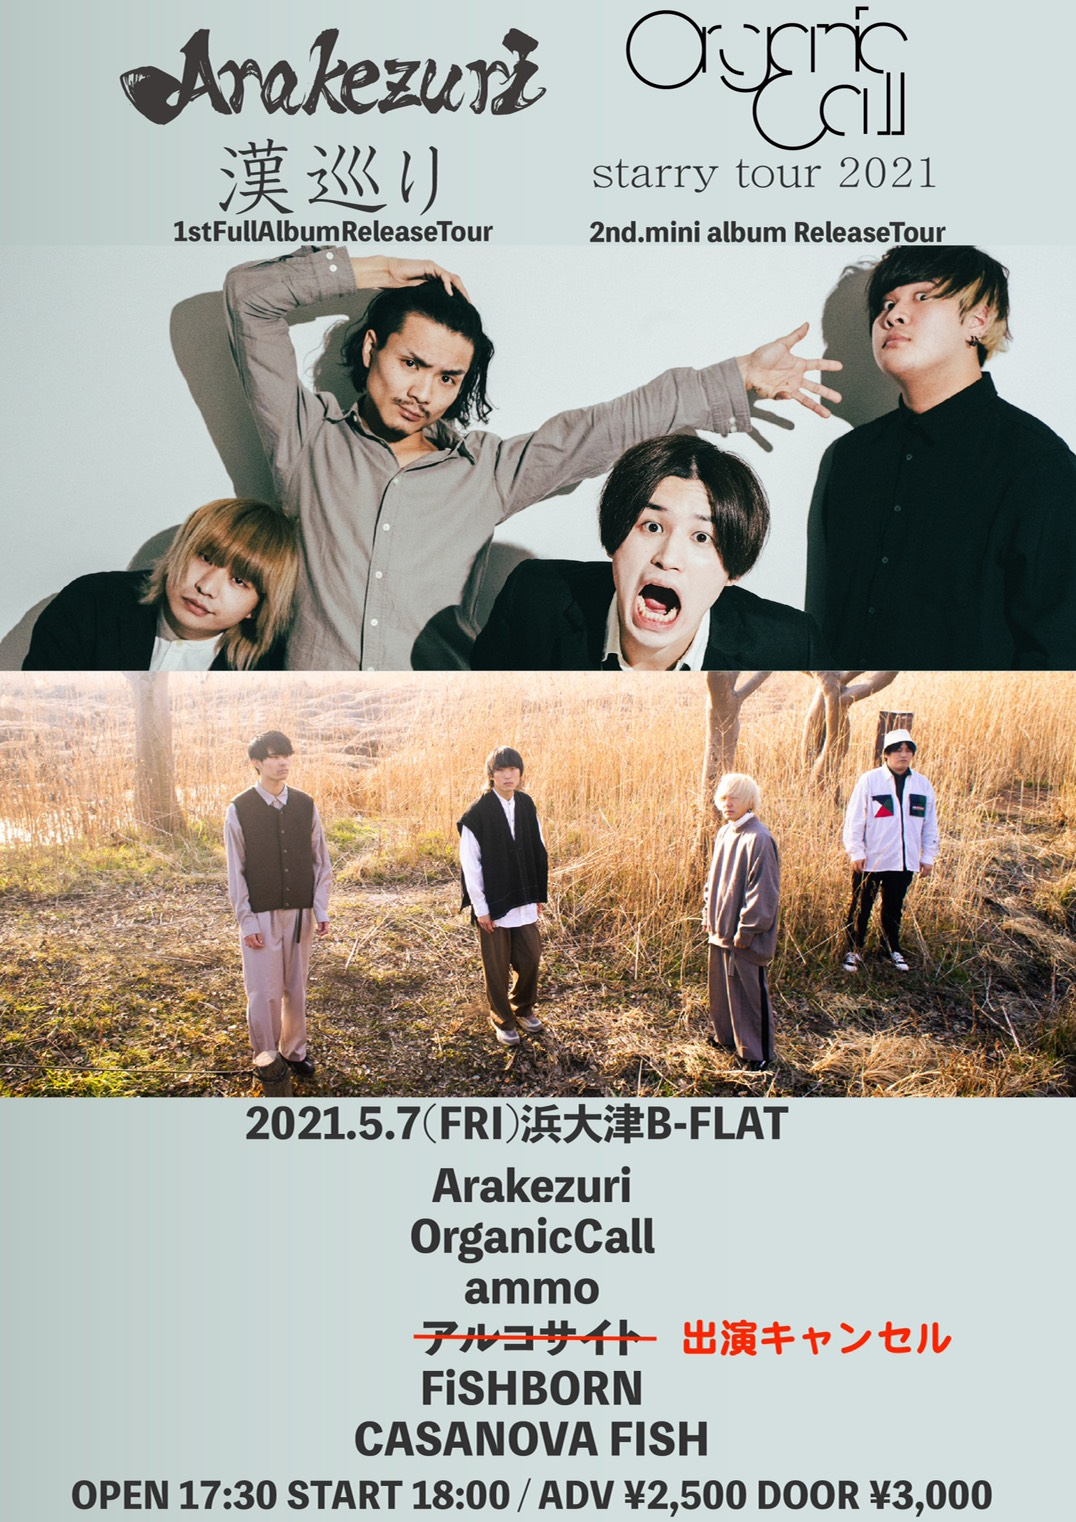 "Arakezuri 1stAlbum『PORTFOLIO』ReleaseTour""漢巡"